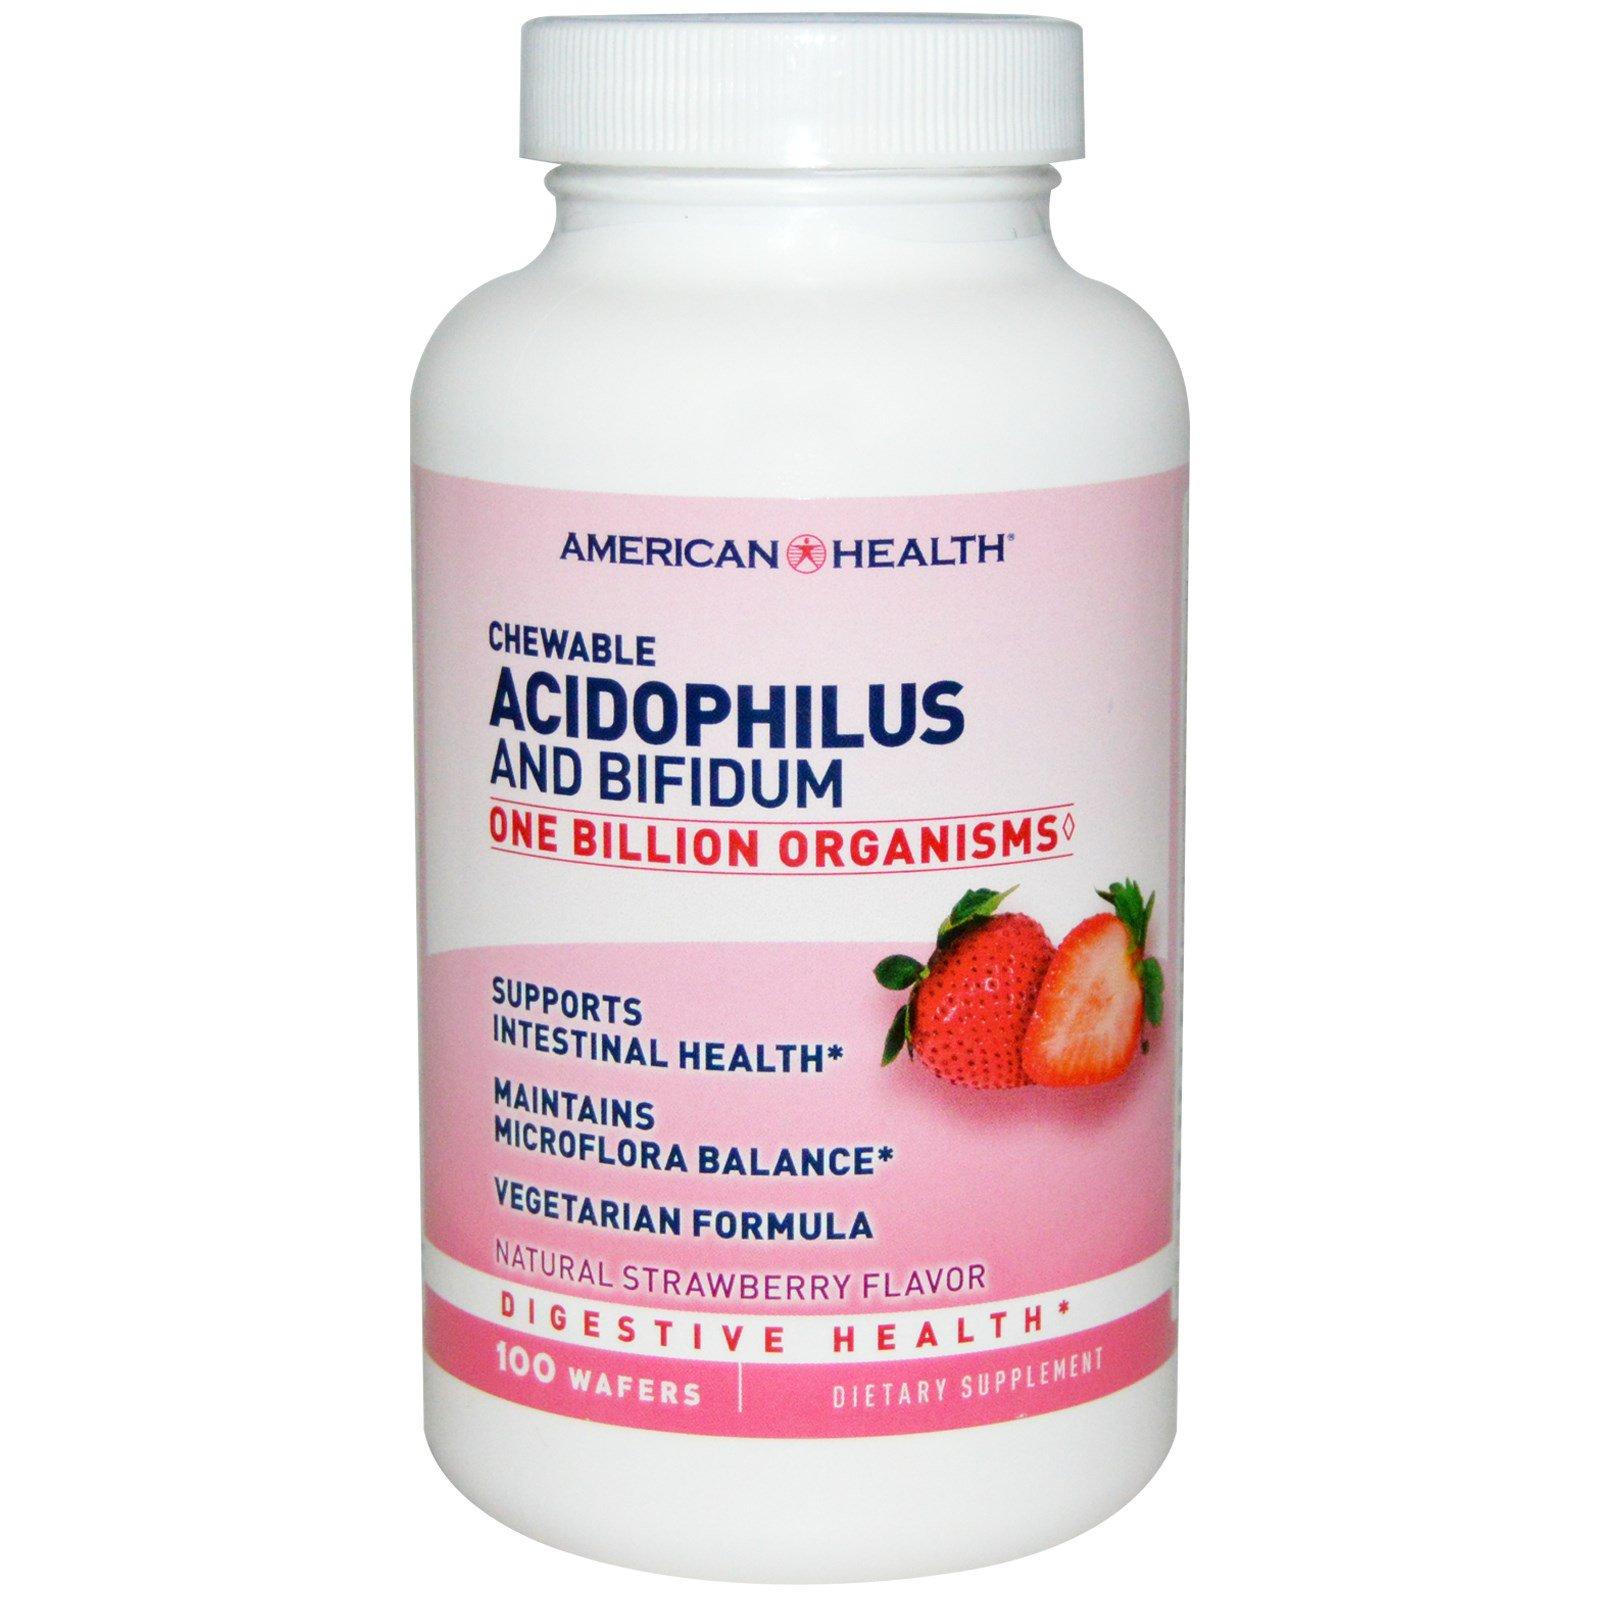 American Health, Chewable Acidophilus and Bifidum, Natural